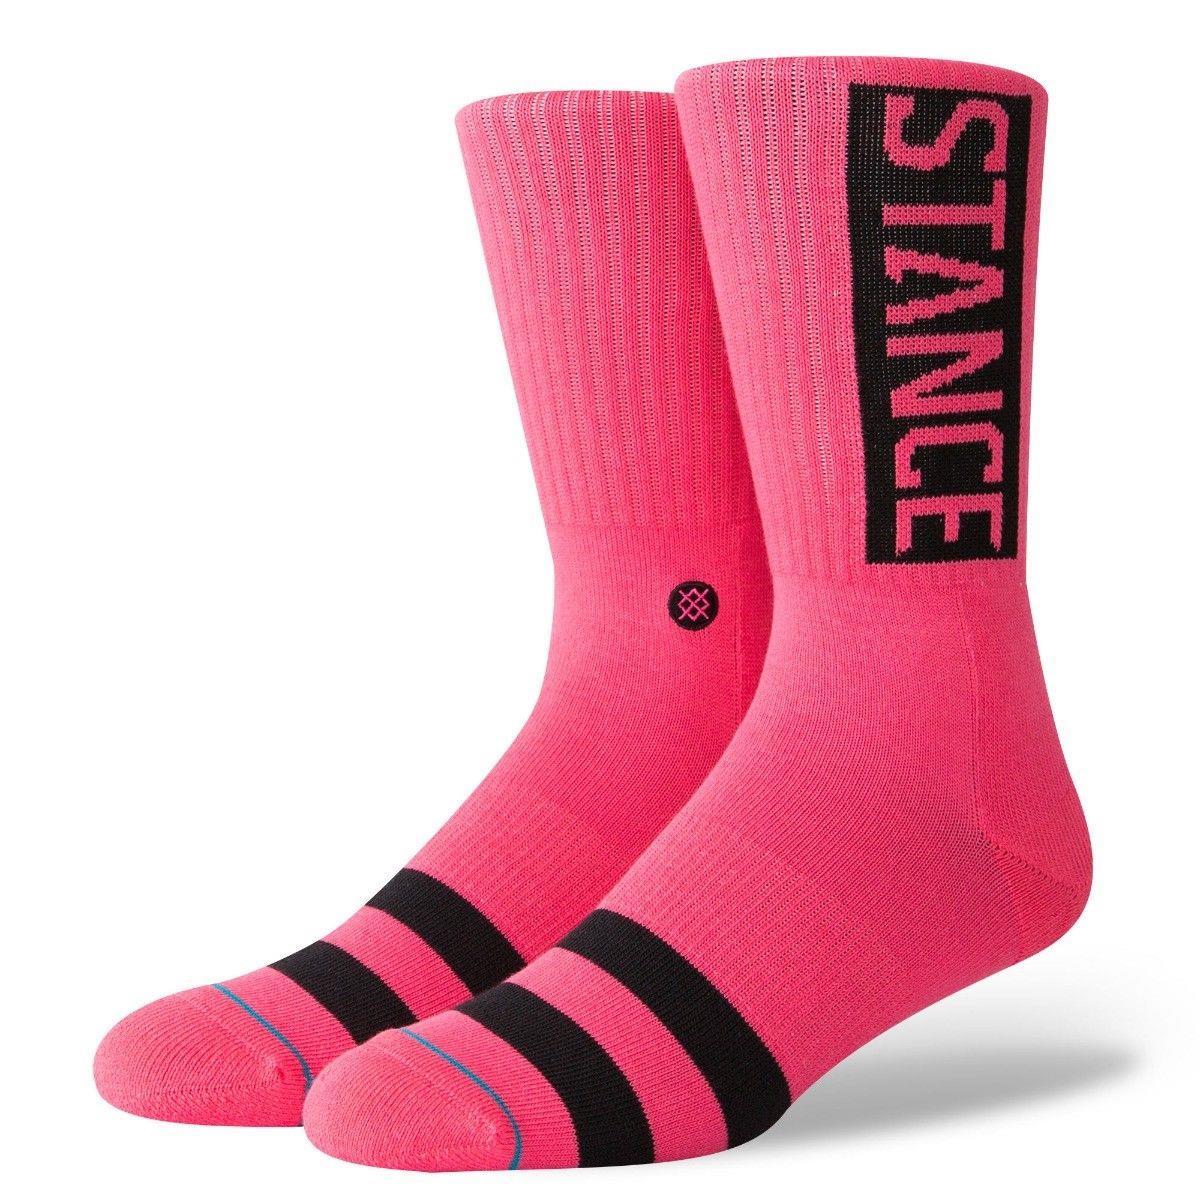 Stance Socks New Men/'s Icon Chaussettes bleu pastel BNWT